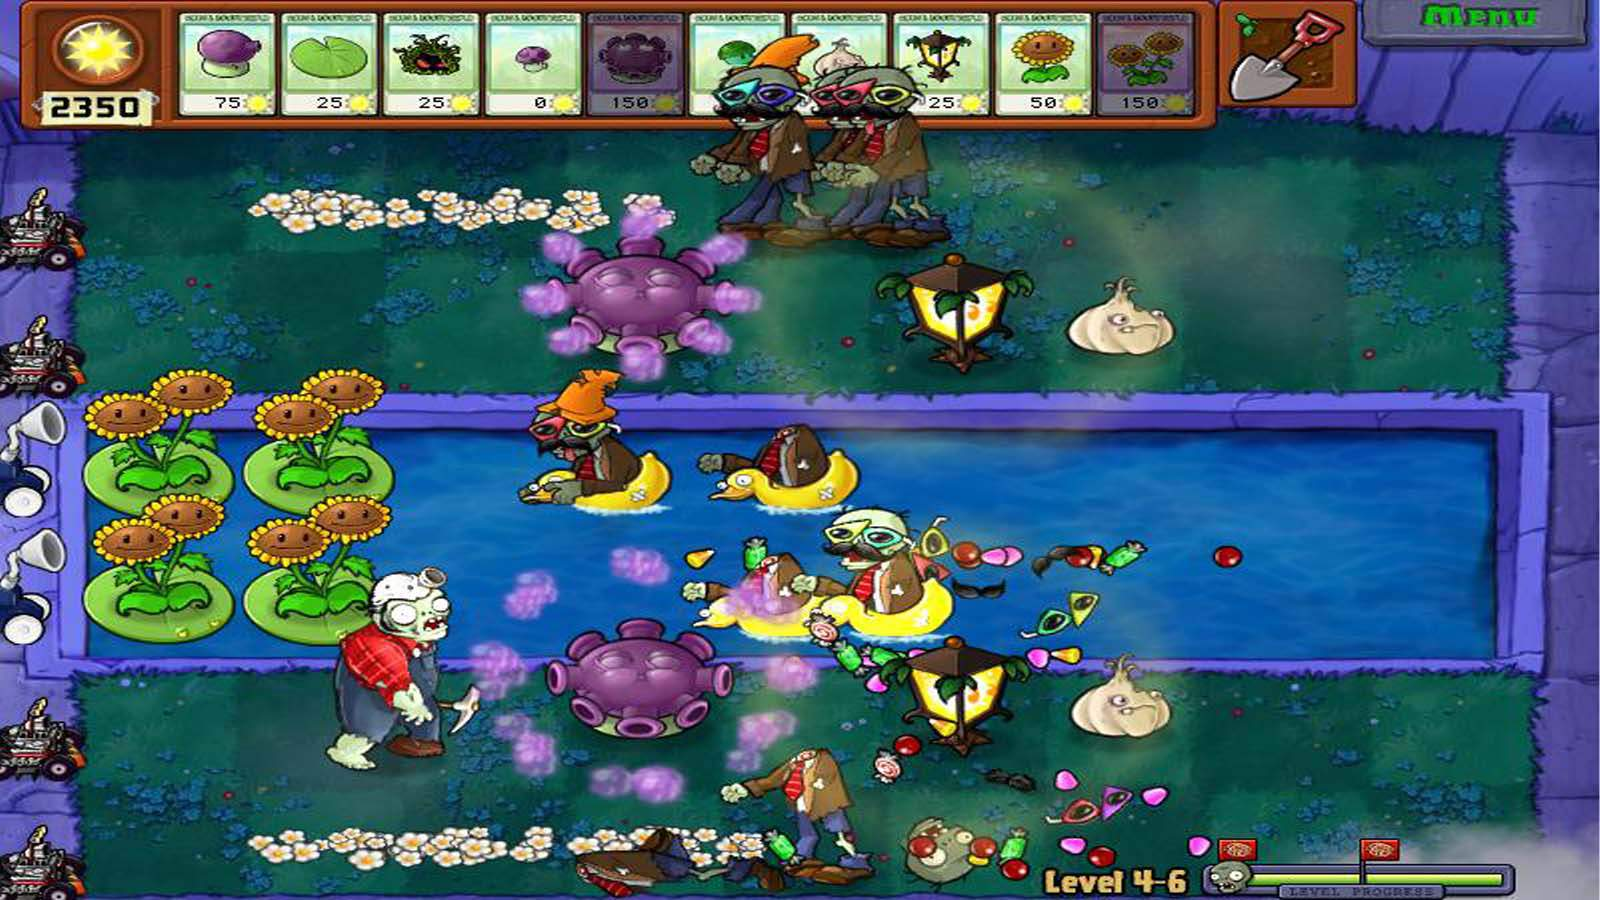 تحميل لعبة Plants Vs Zombie Magic مضغوطة برابط واحد مباشر كاملة مجانا